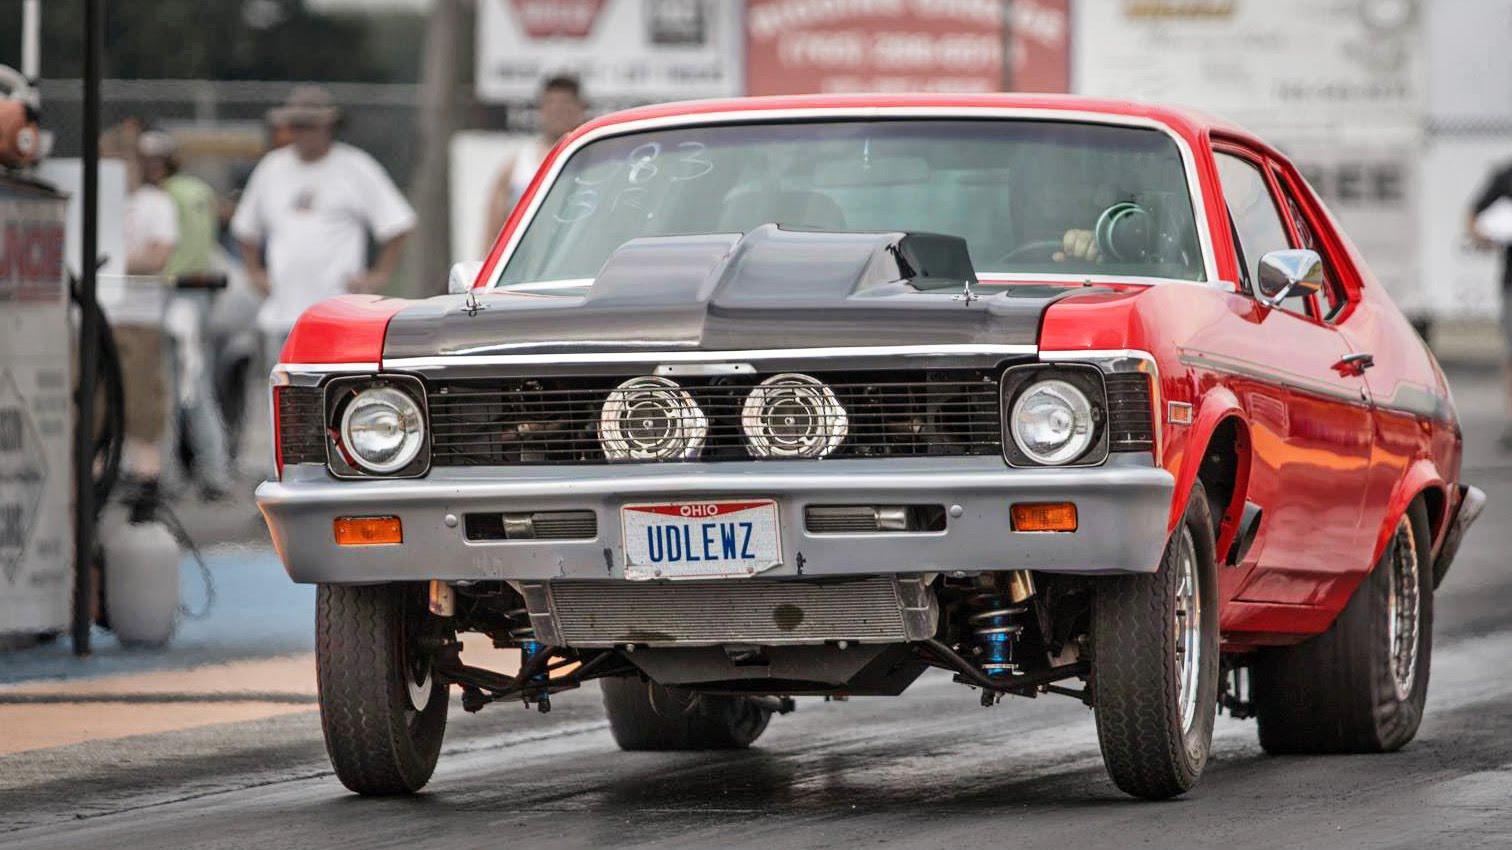 Novacain – 8-Second Twin Turbo Chevy | DragTimes.com Drag Racing ...